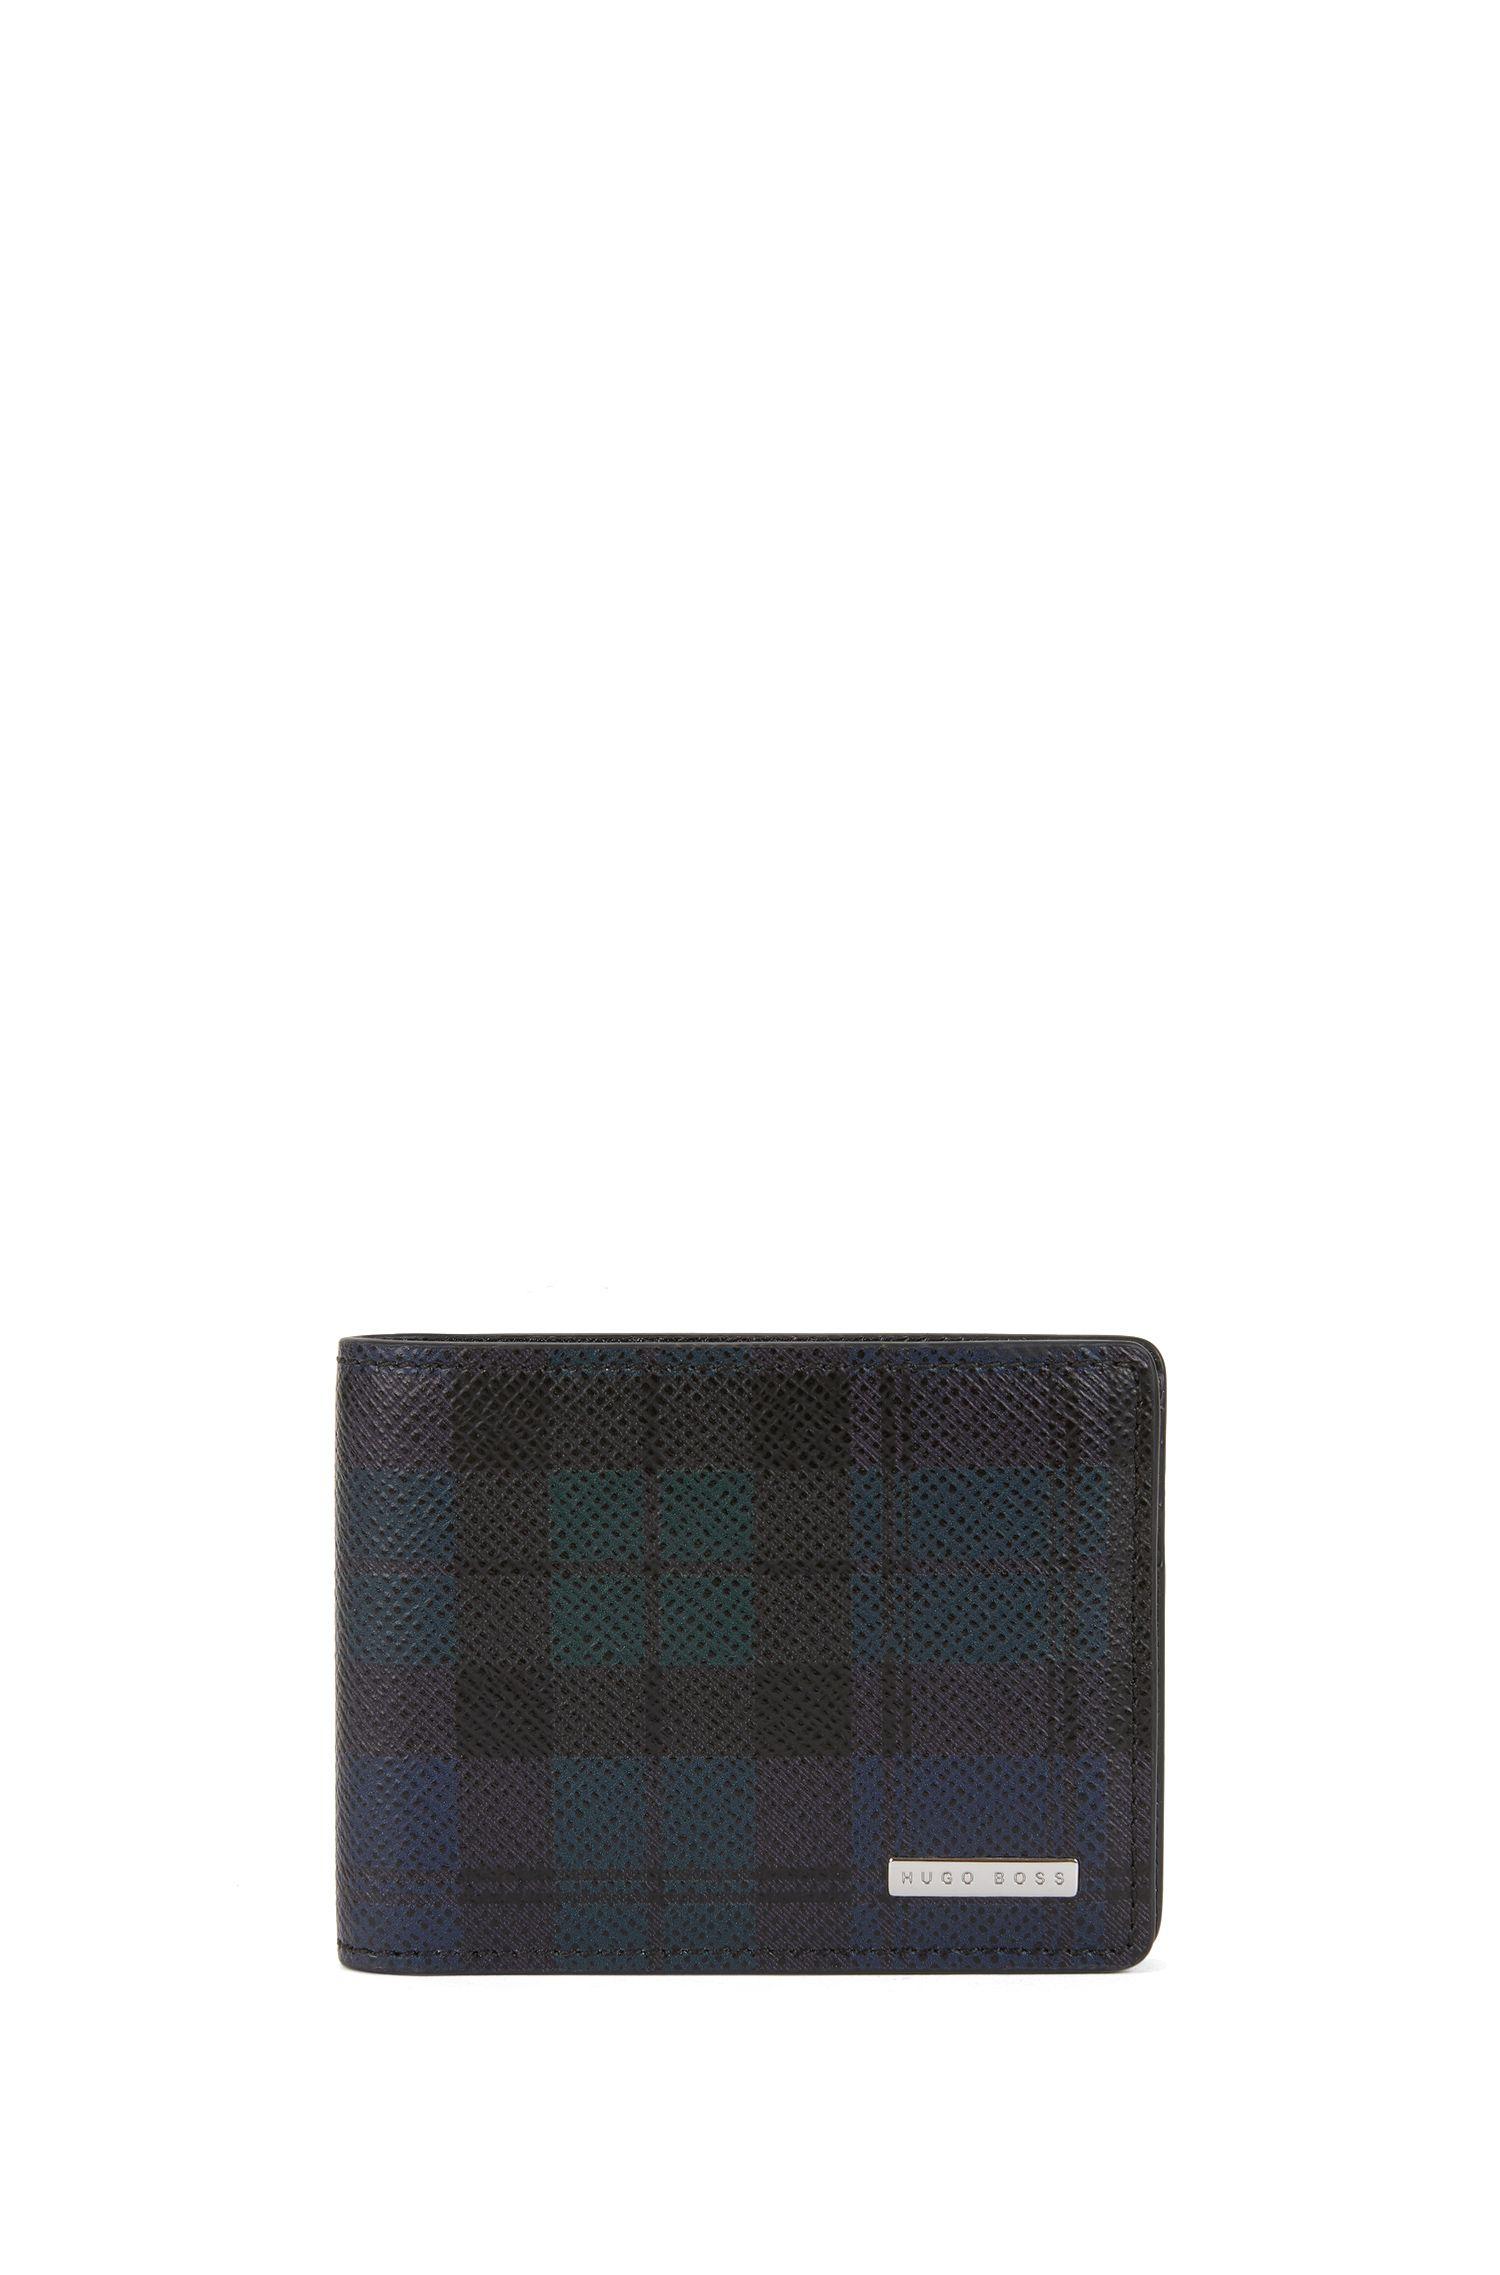 Black Watch Leather Billfold Wallet | Signature BW 6 cc